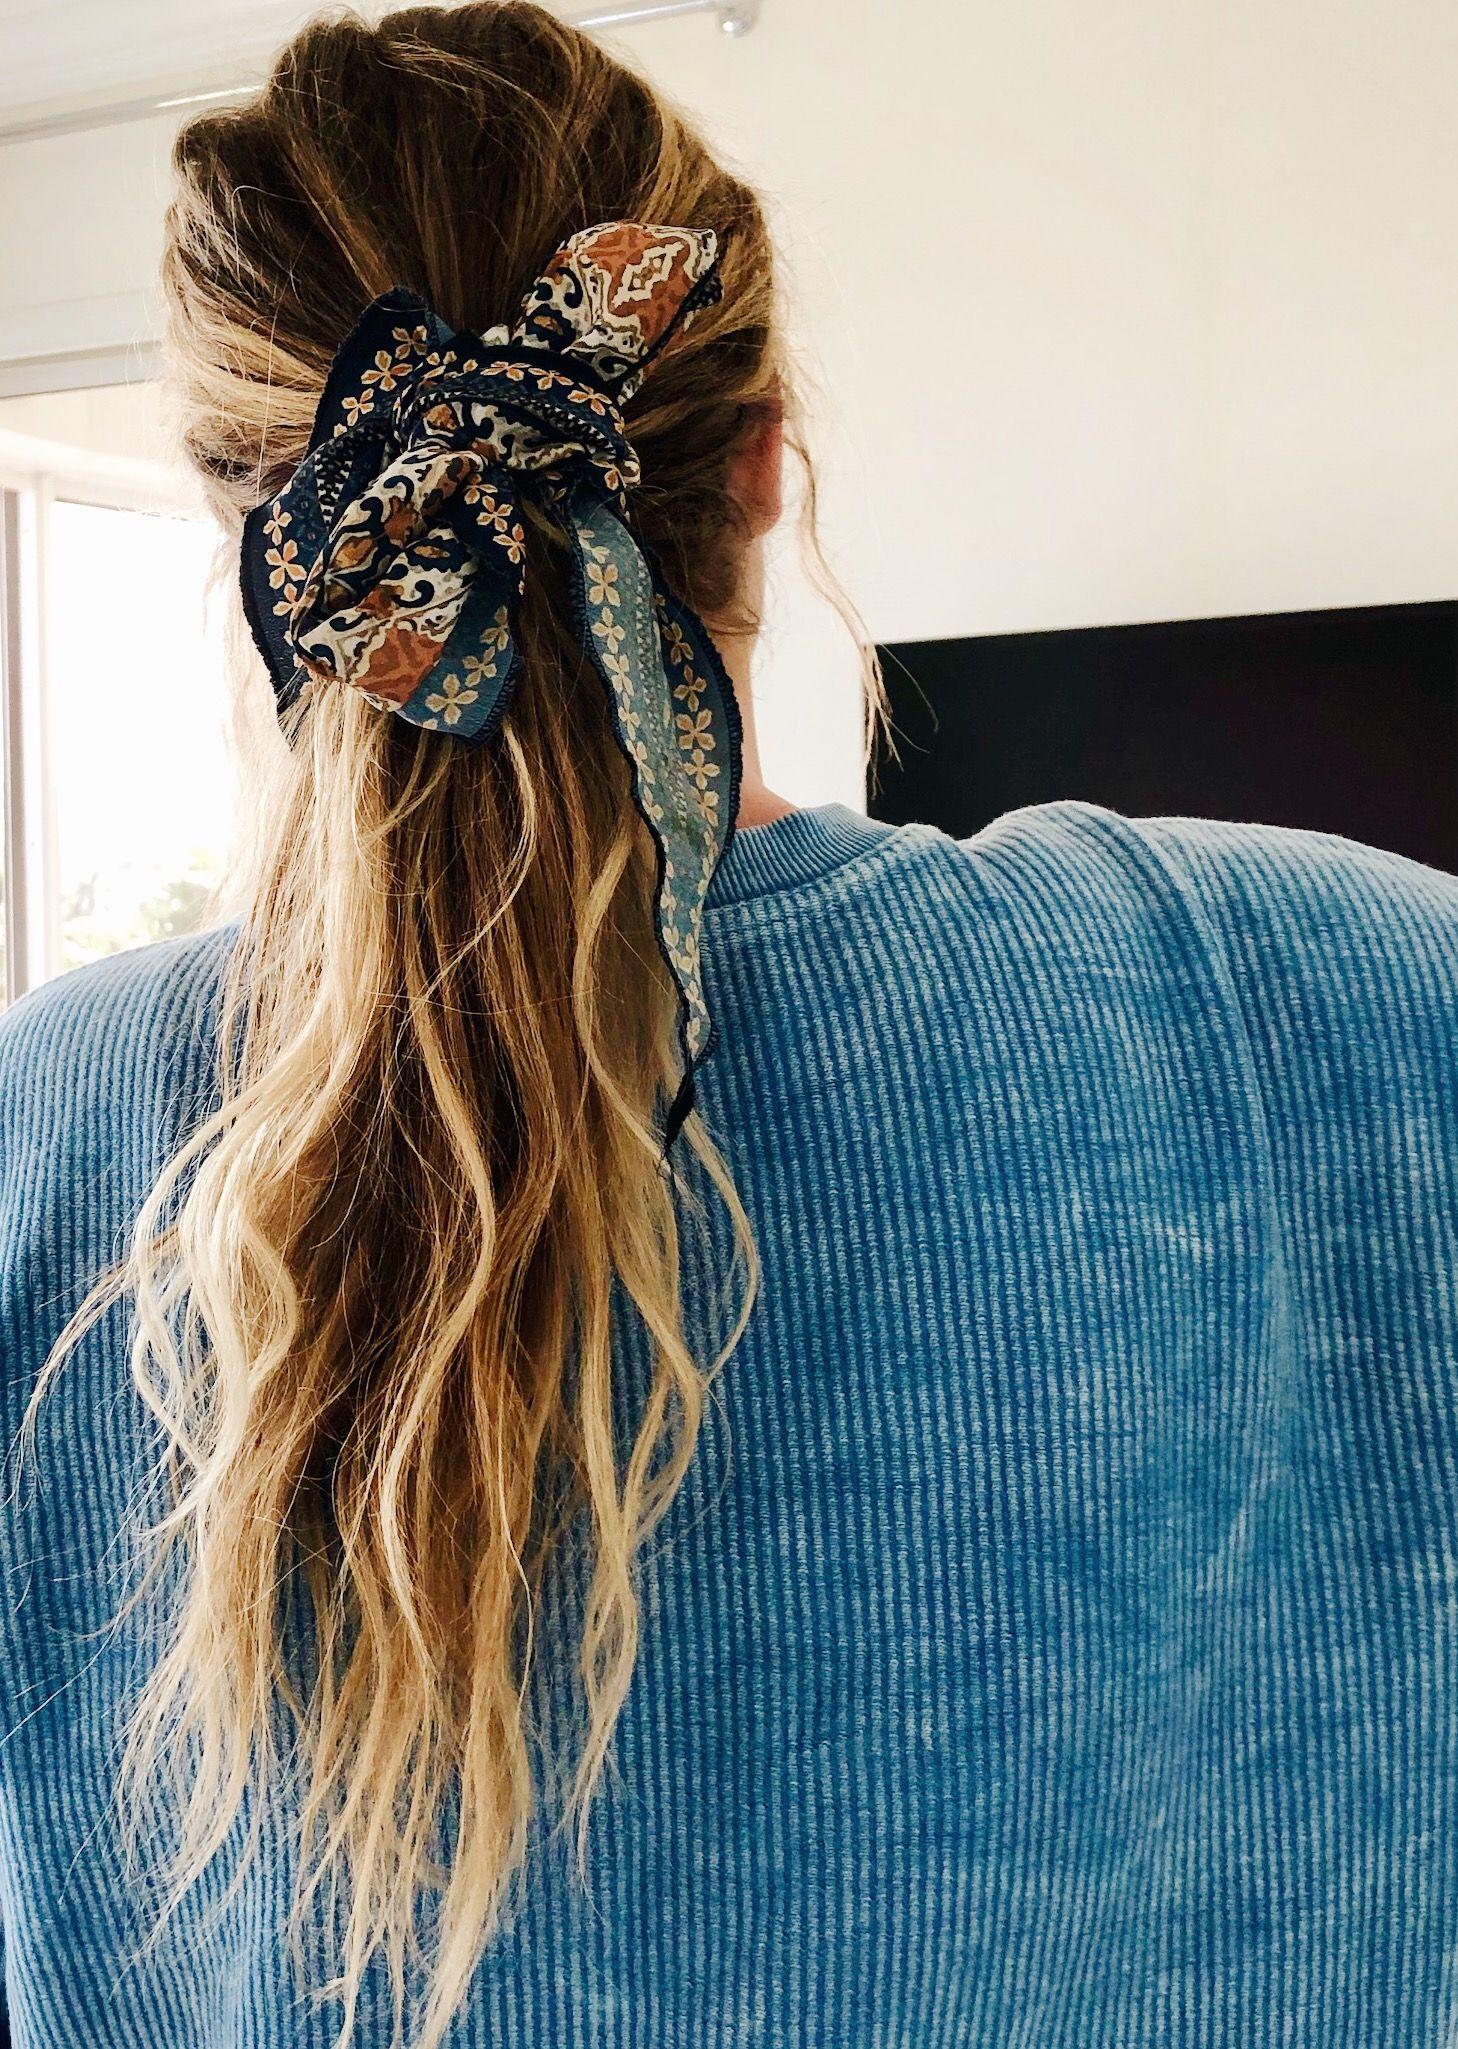 VSCO , claudiaschaefer Pinterest Hair, Hair Inspo, Curly Hair Styles,  Beauty, Hairstyle